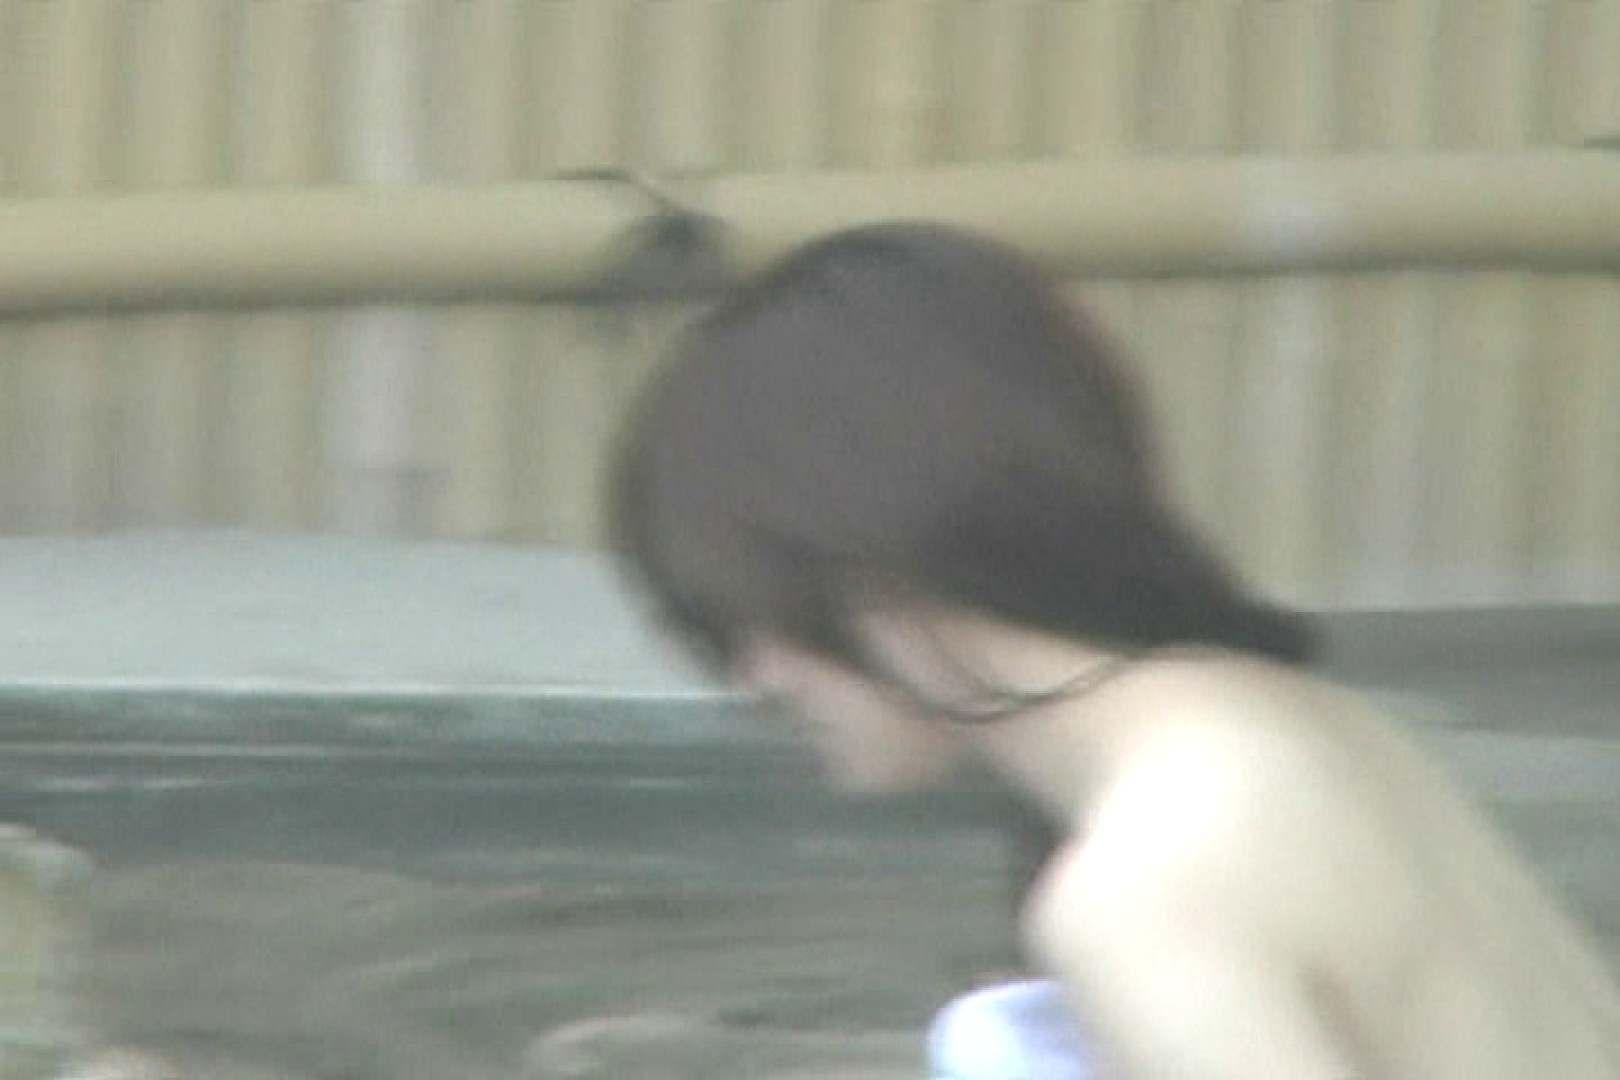 Aquaな露天風呂Vol.590 HなOL 濡れ場動画紹介 112pic 2